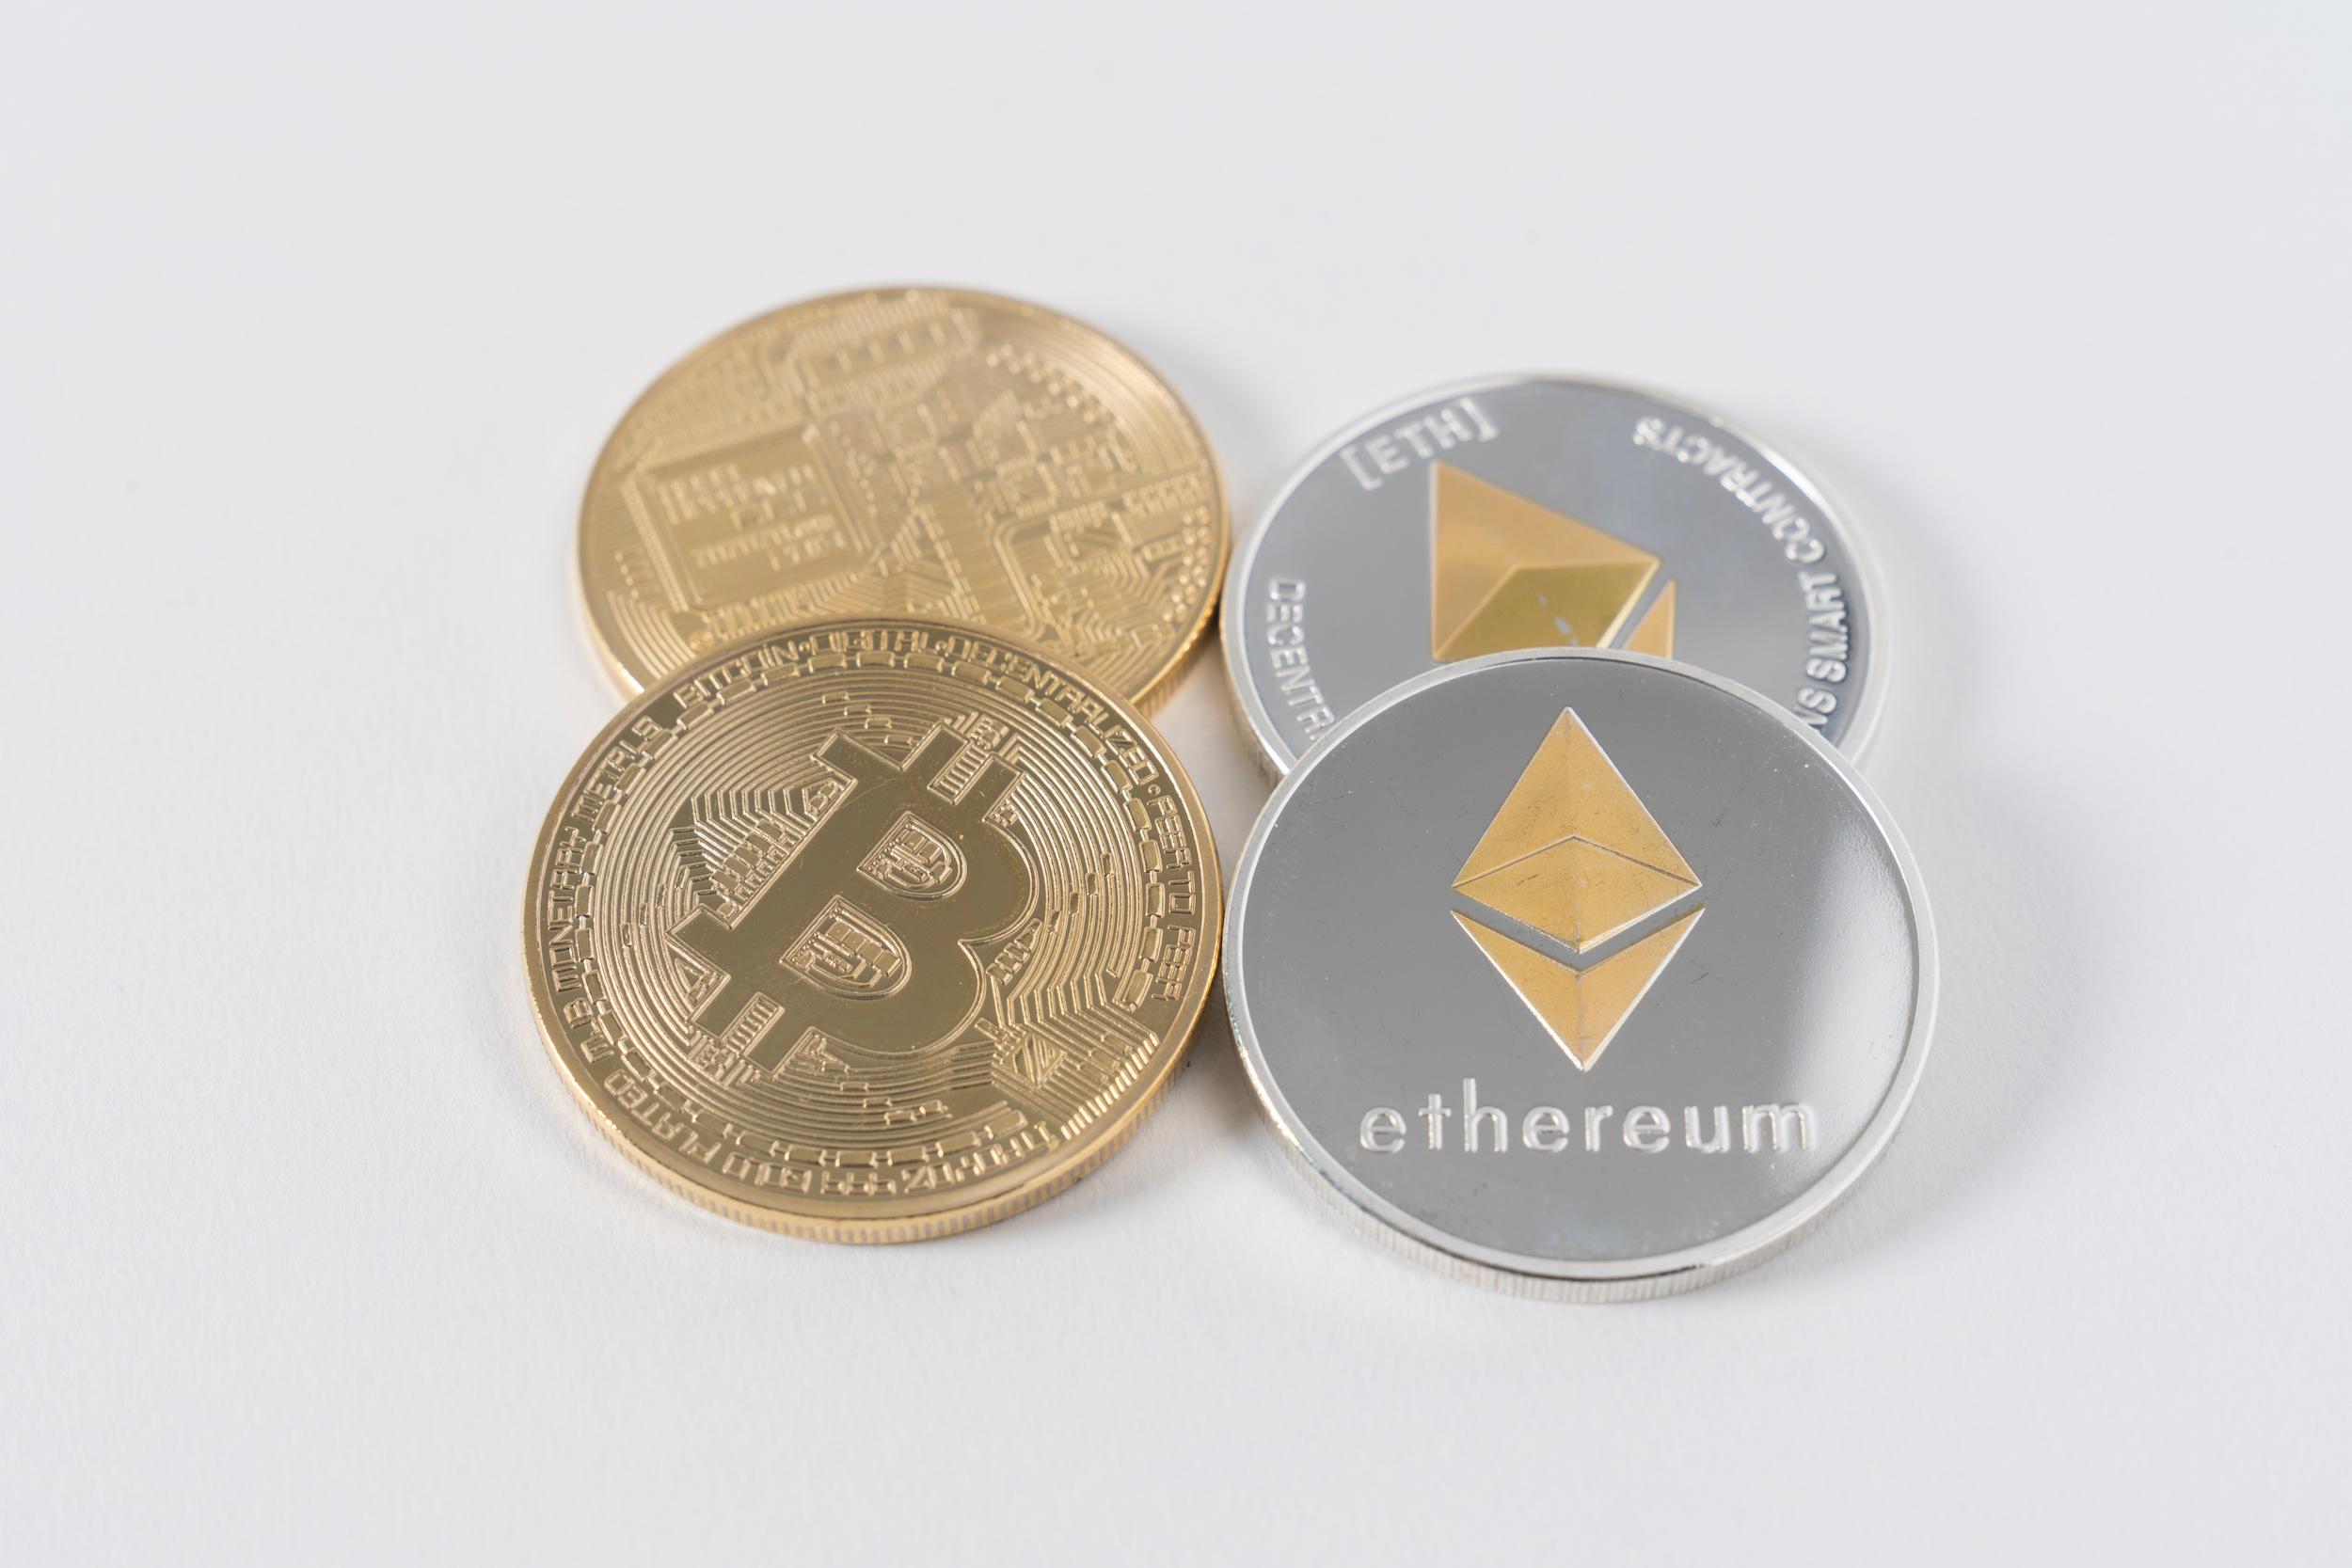 apakah prekyba bitcoin halal